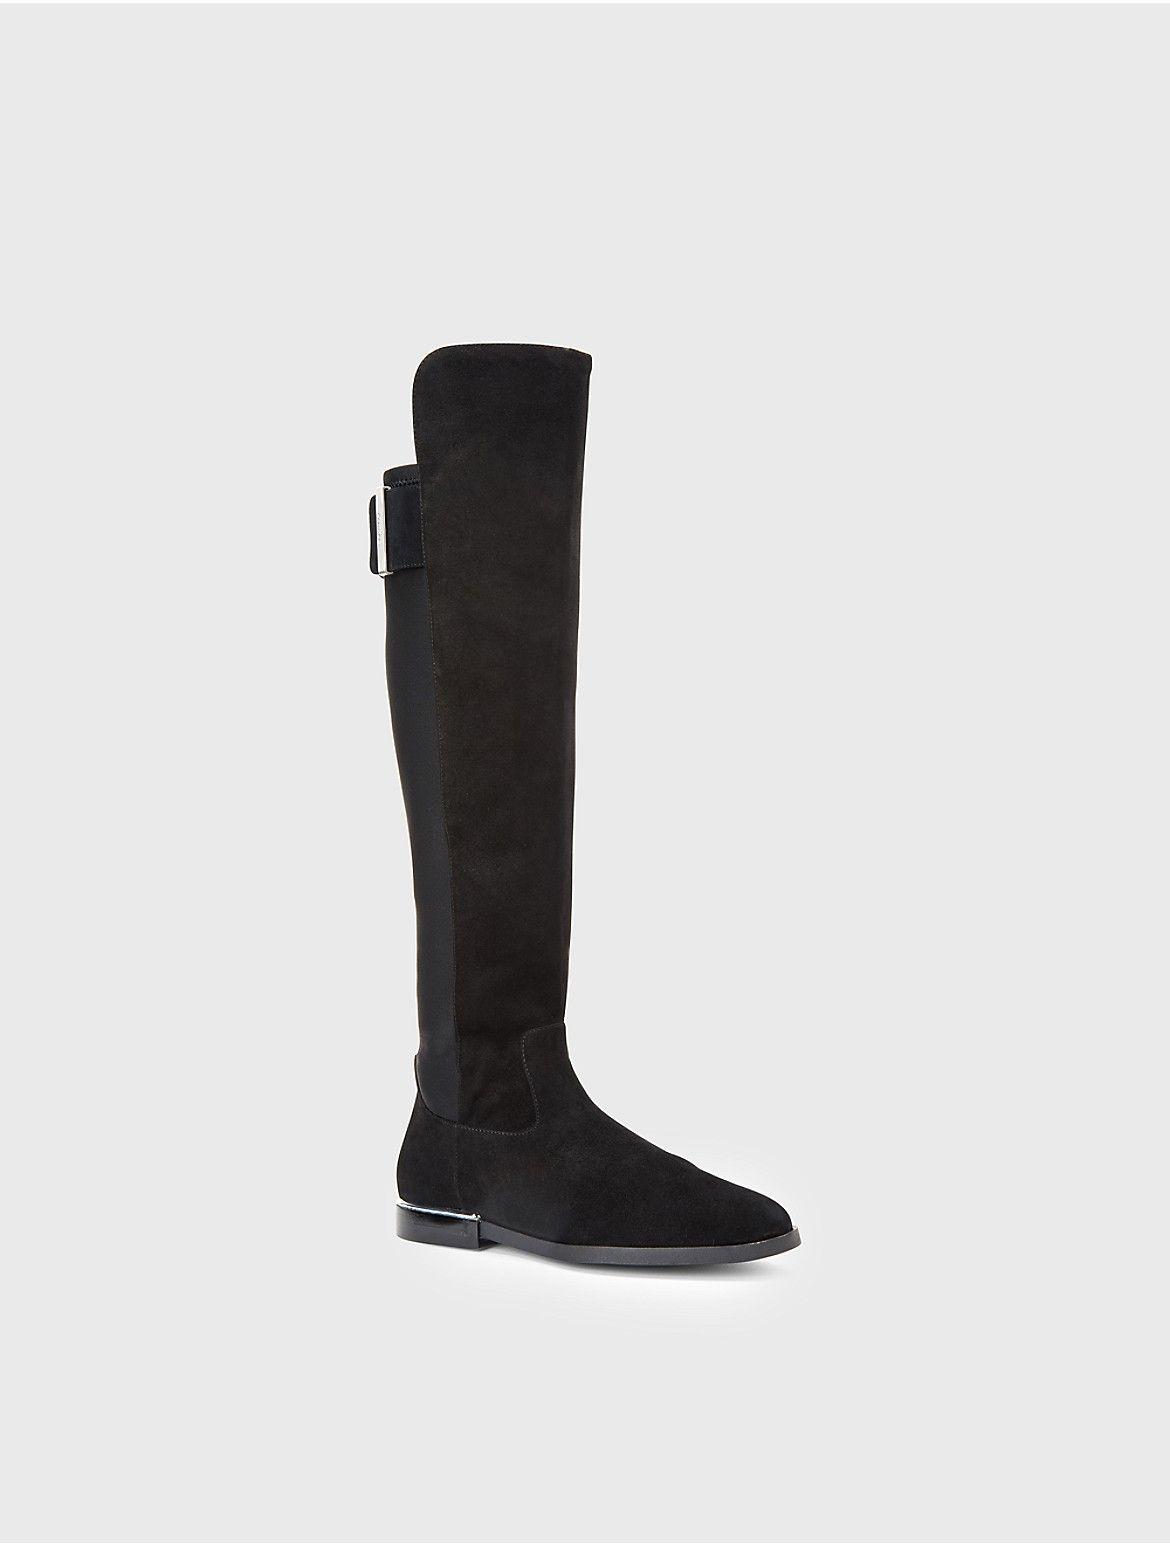 cdc3bb76207 Priya leather high boot